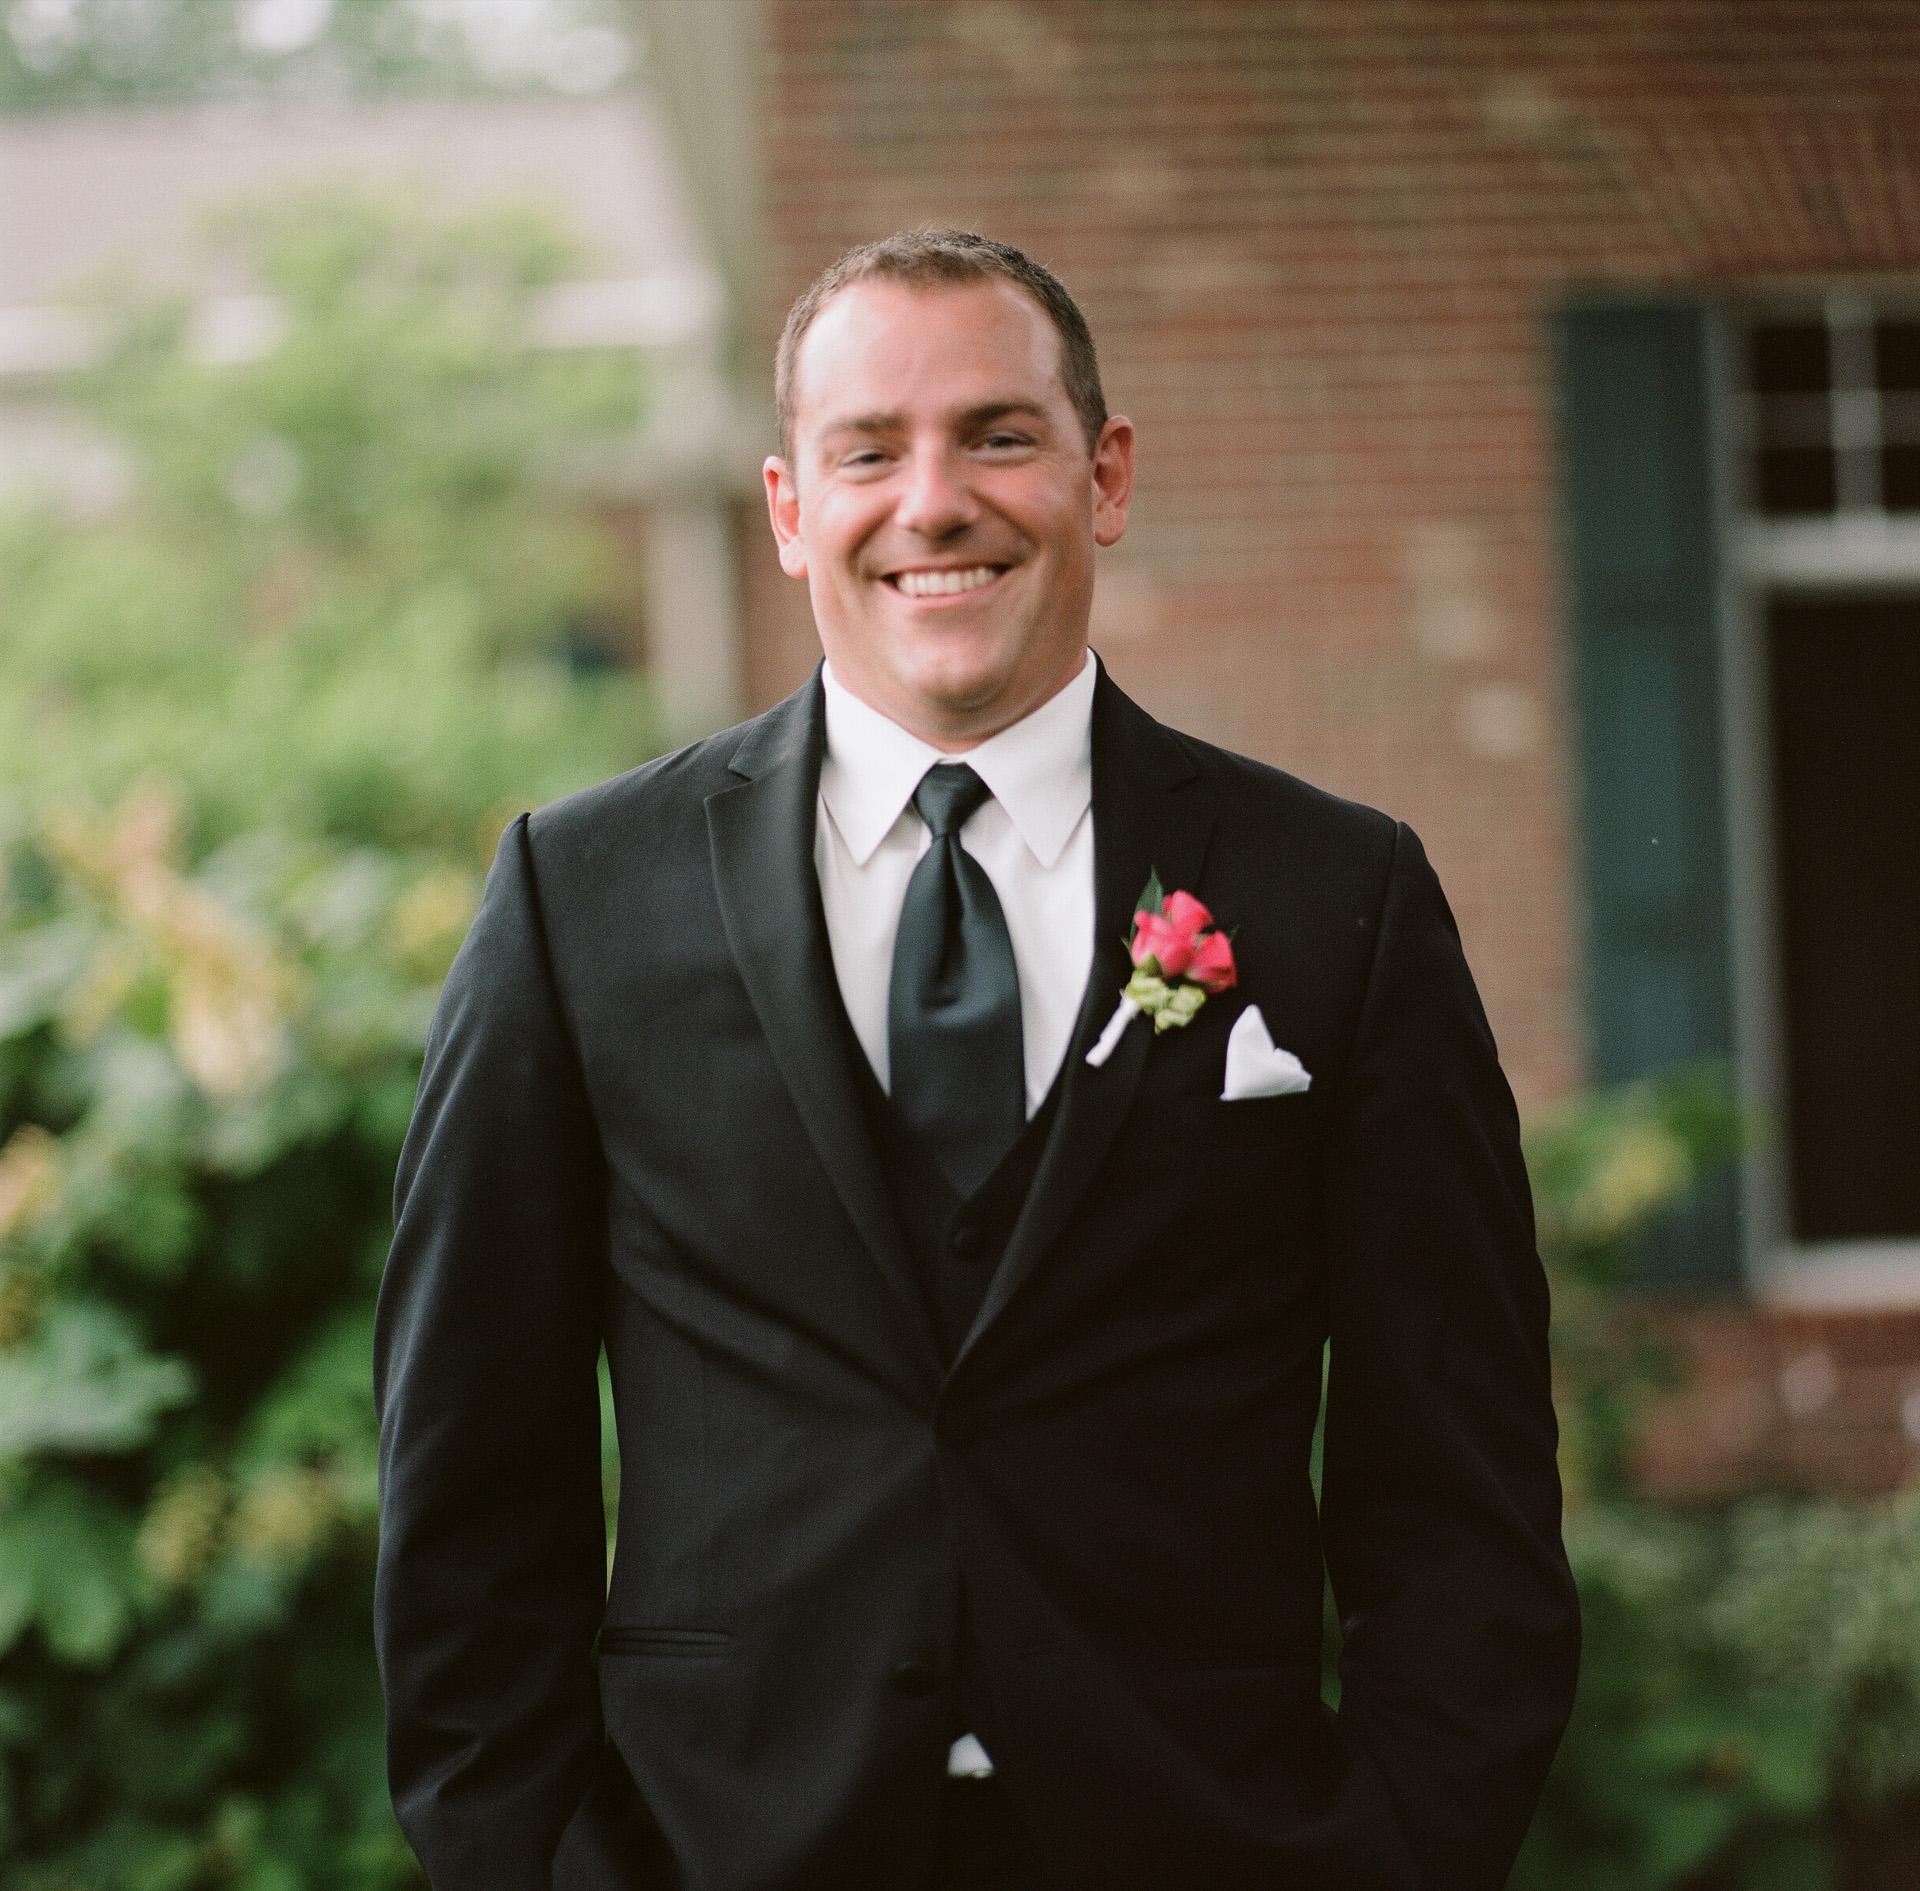 Dayton Wedding Photographer - Groom Portrait